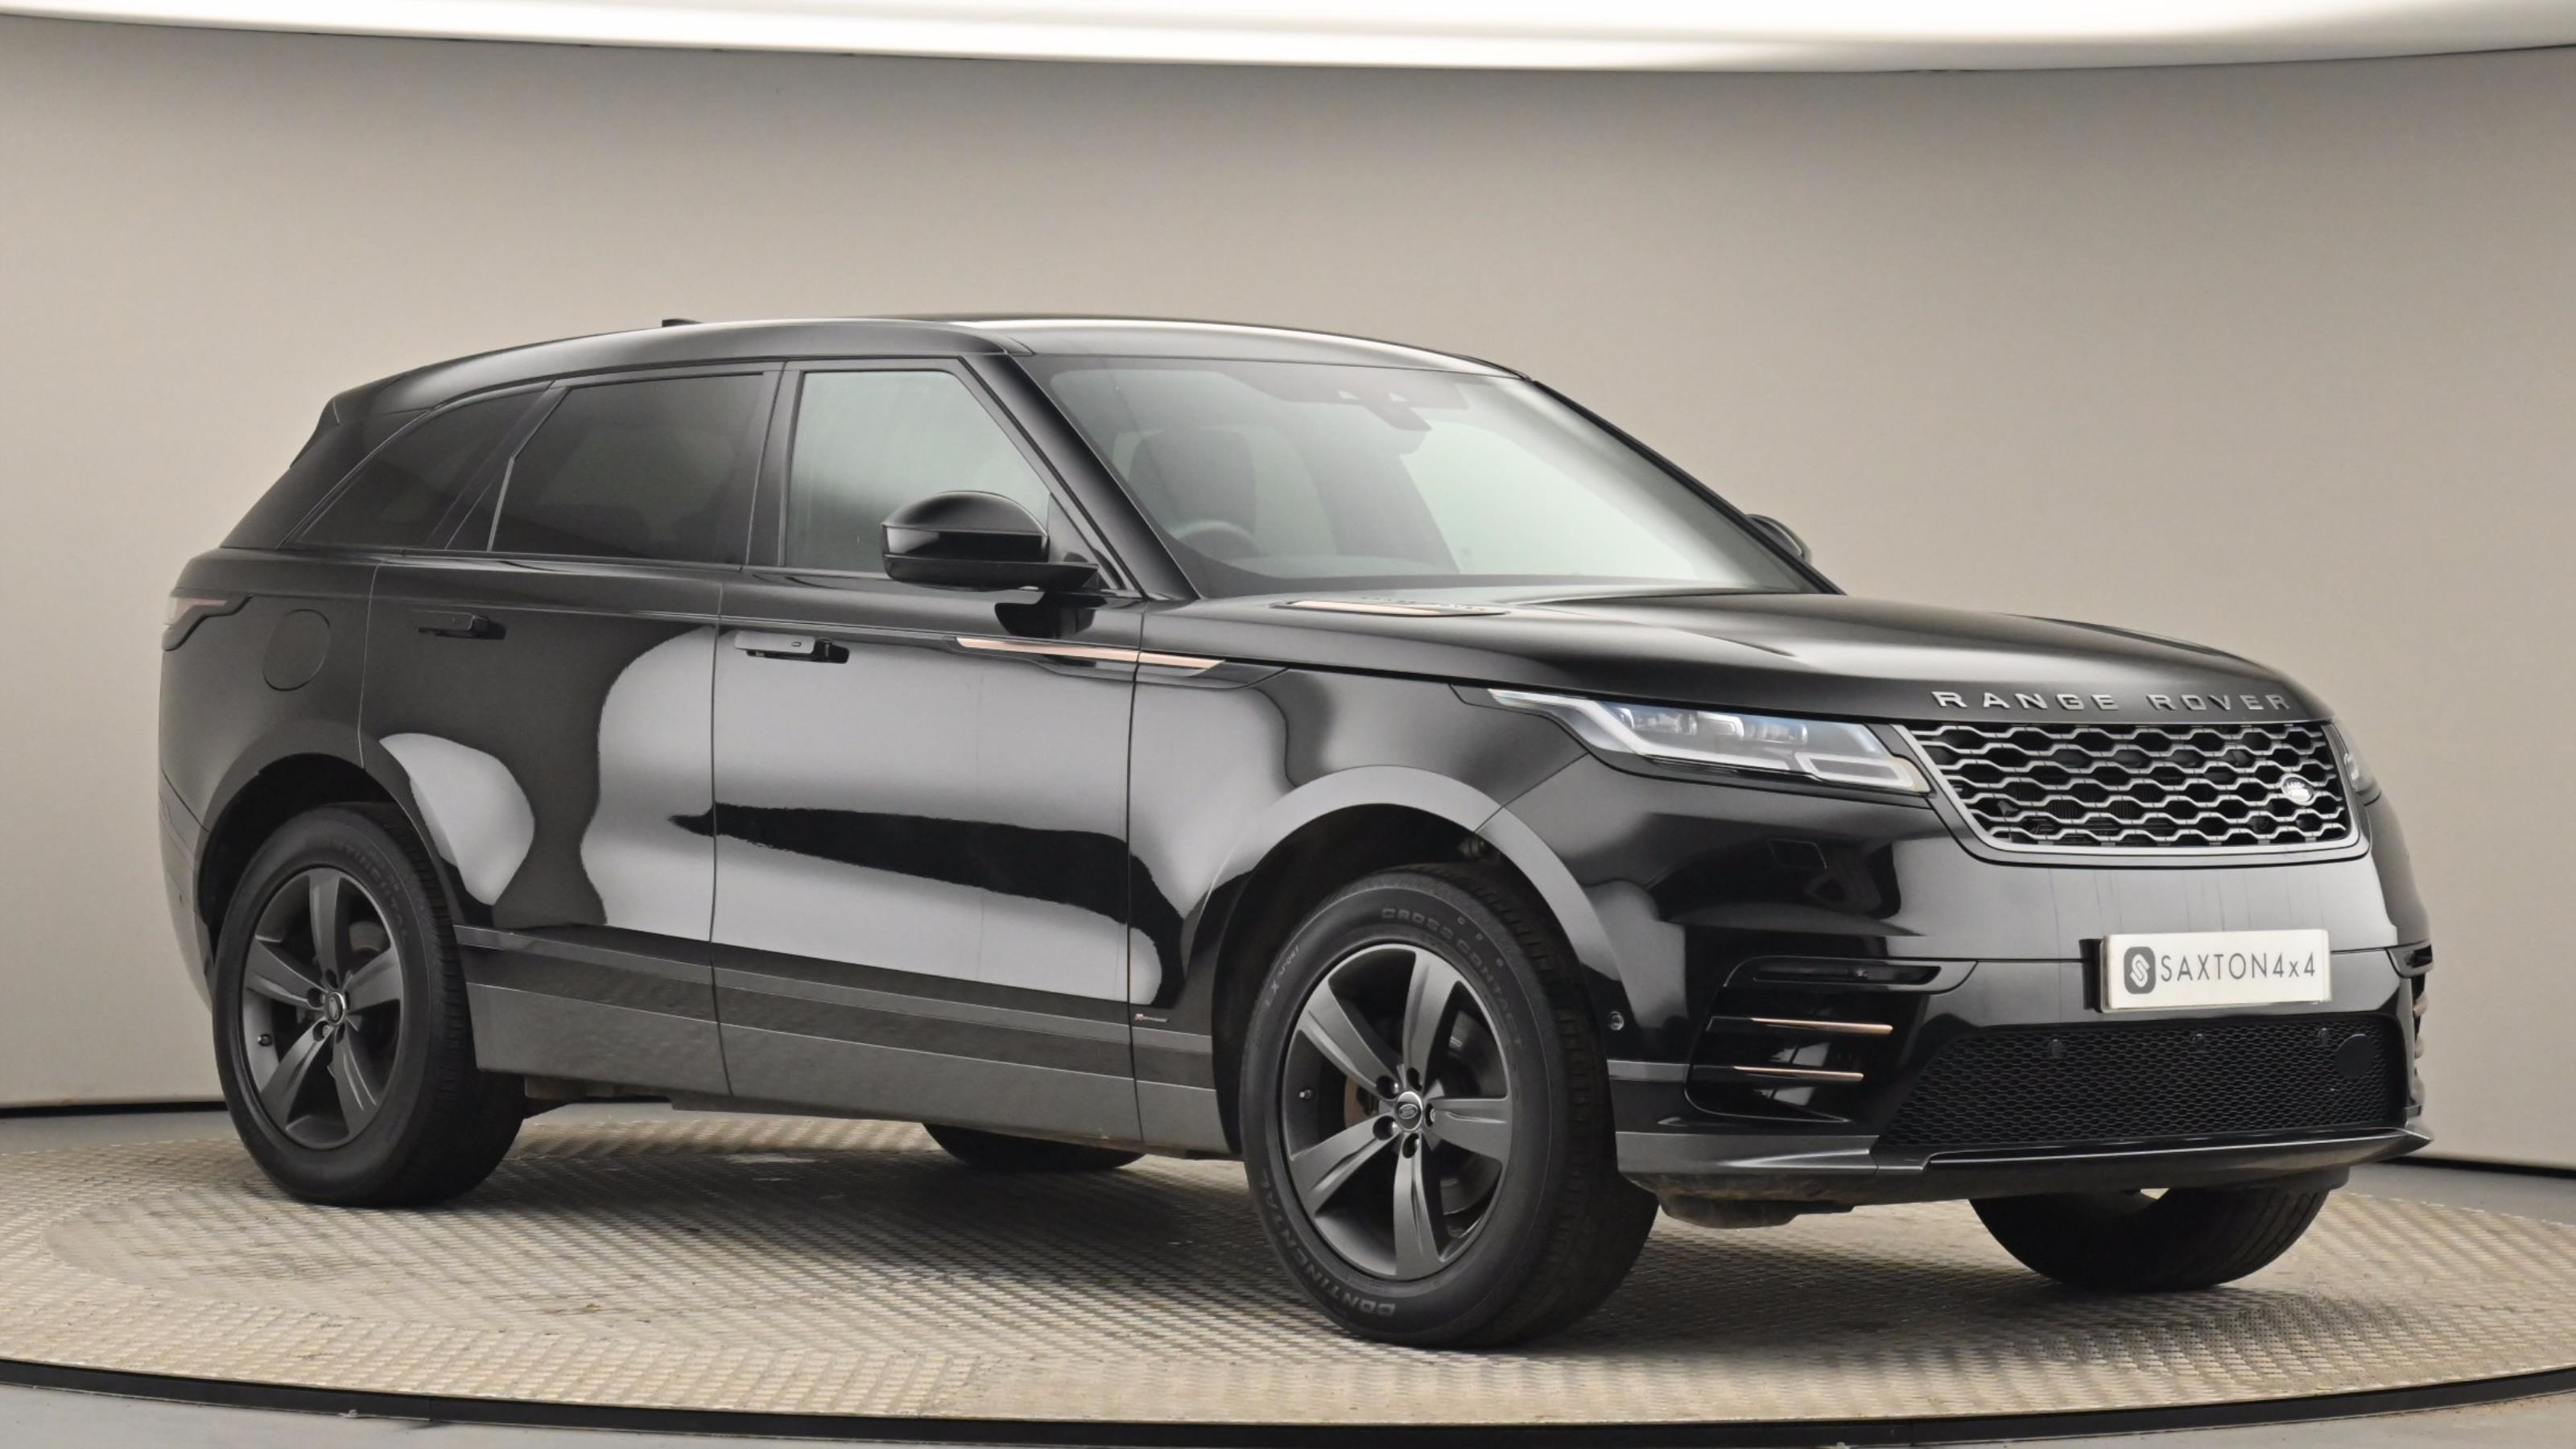 Used 2018 Land Rover RANGE ROVER VELAR 2.0 D240 R-Dynamic HSE 5dr Auto BLACK at Saxton4x4